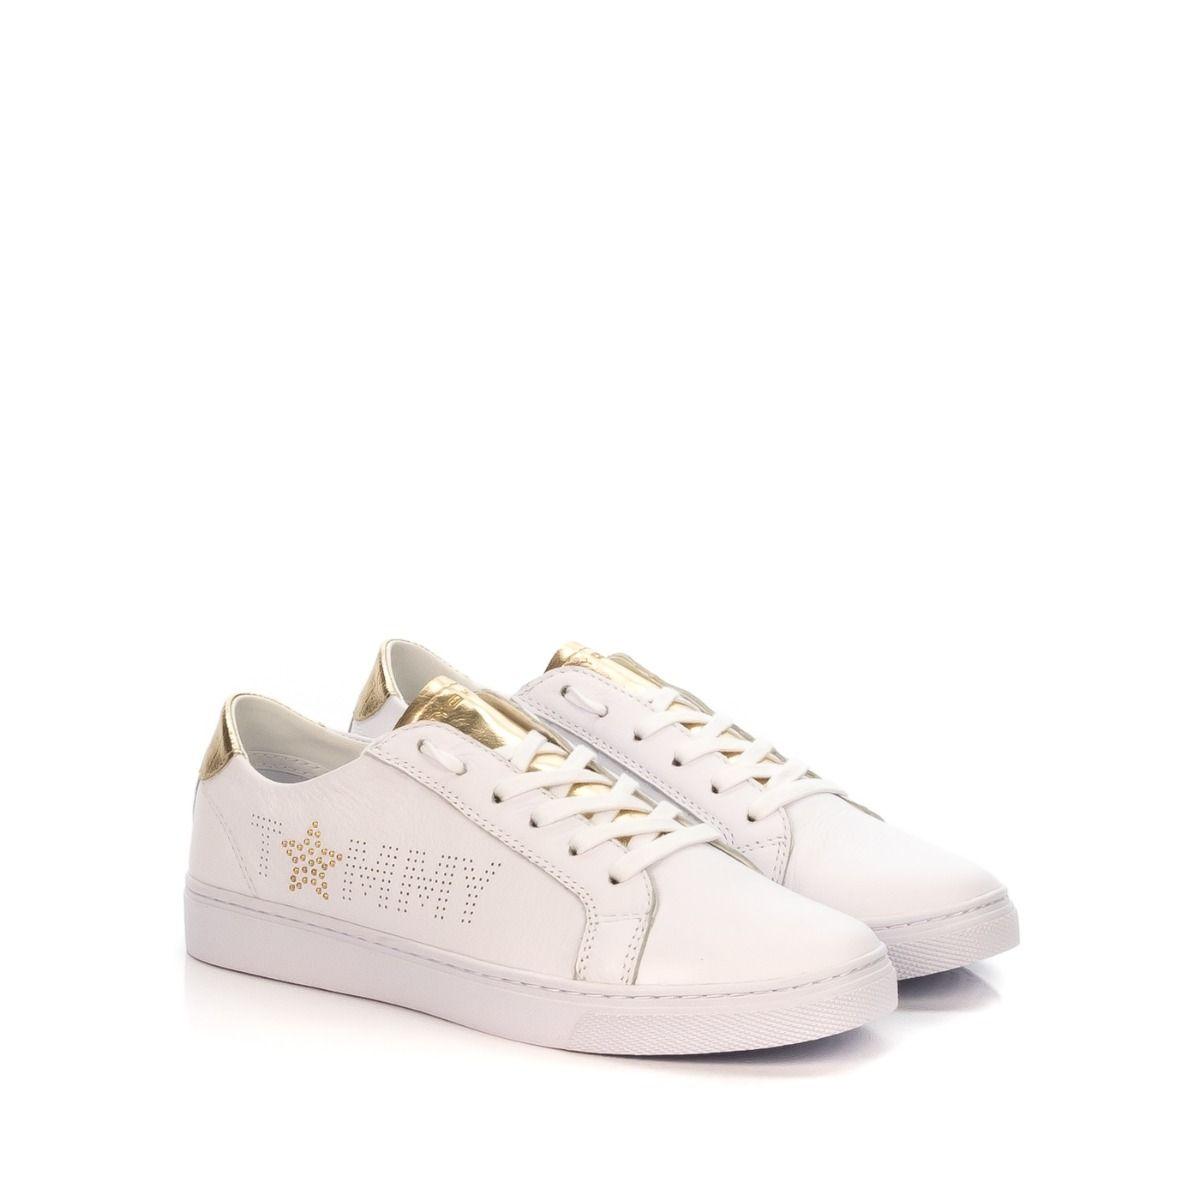 Sneakers donna TOMMY HILFIGER VENUS2349 902 in pelle bianco